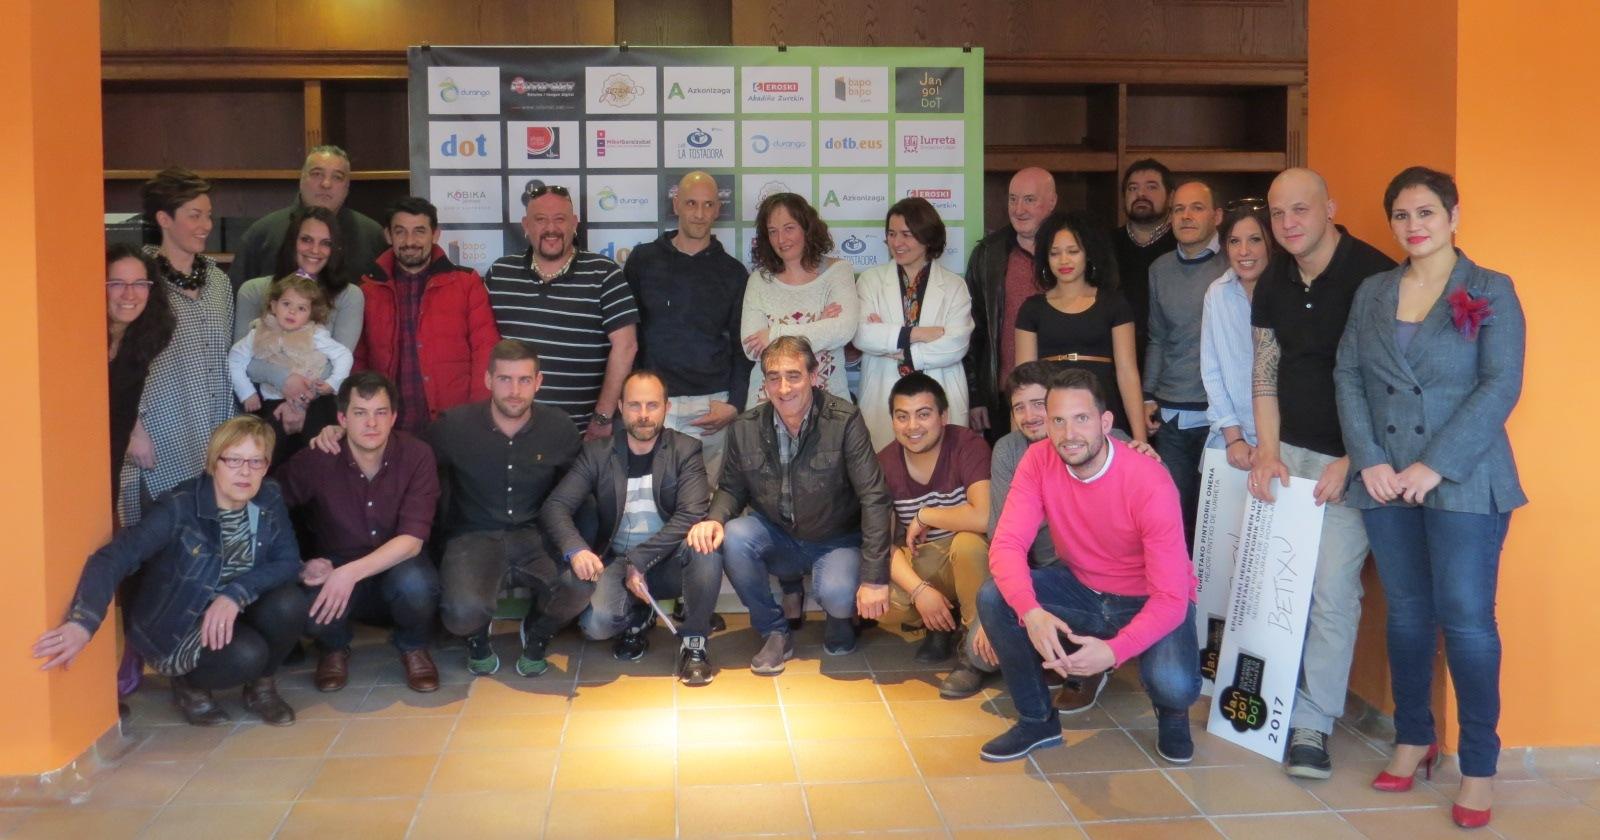 jangodot.eus | Sari banaketa 2017 – Entrega de premios 2017